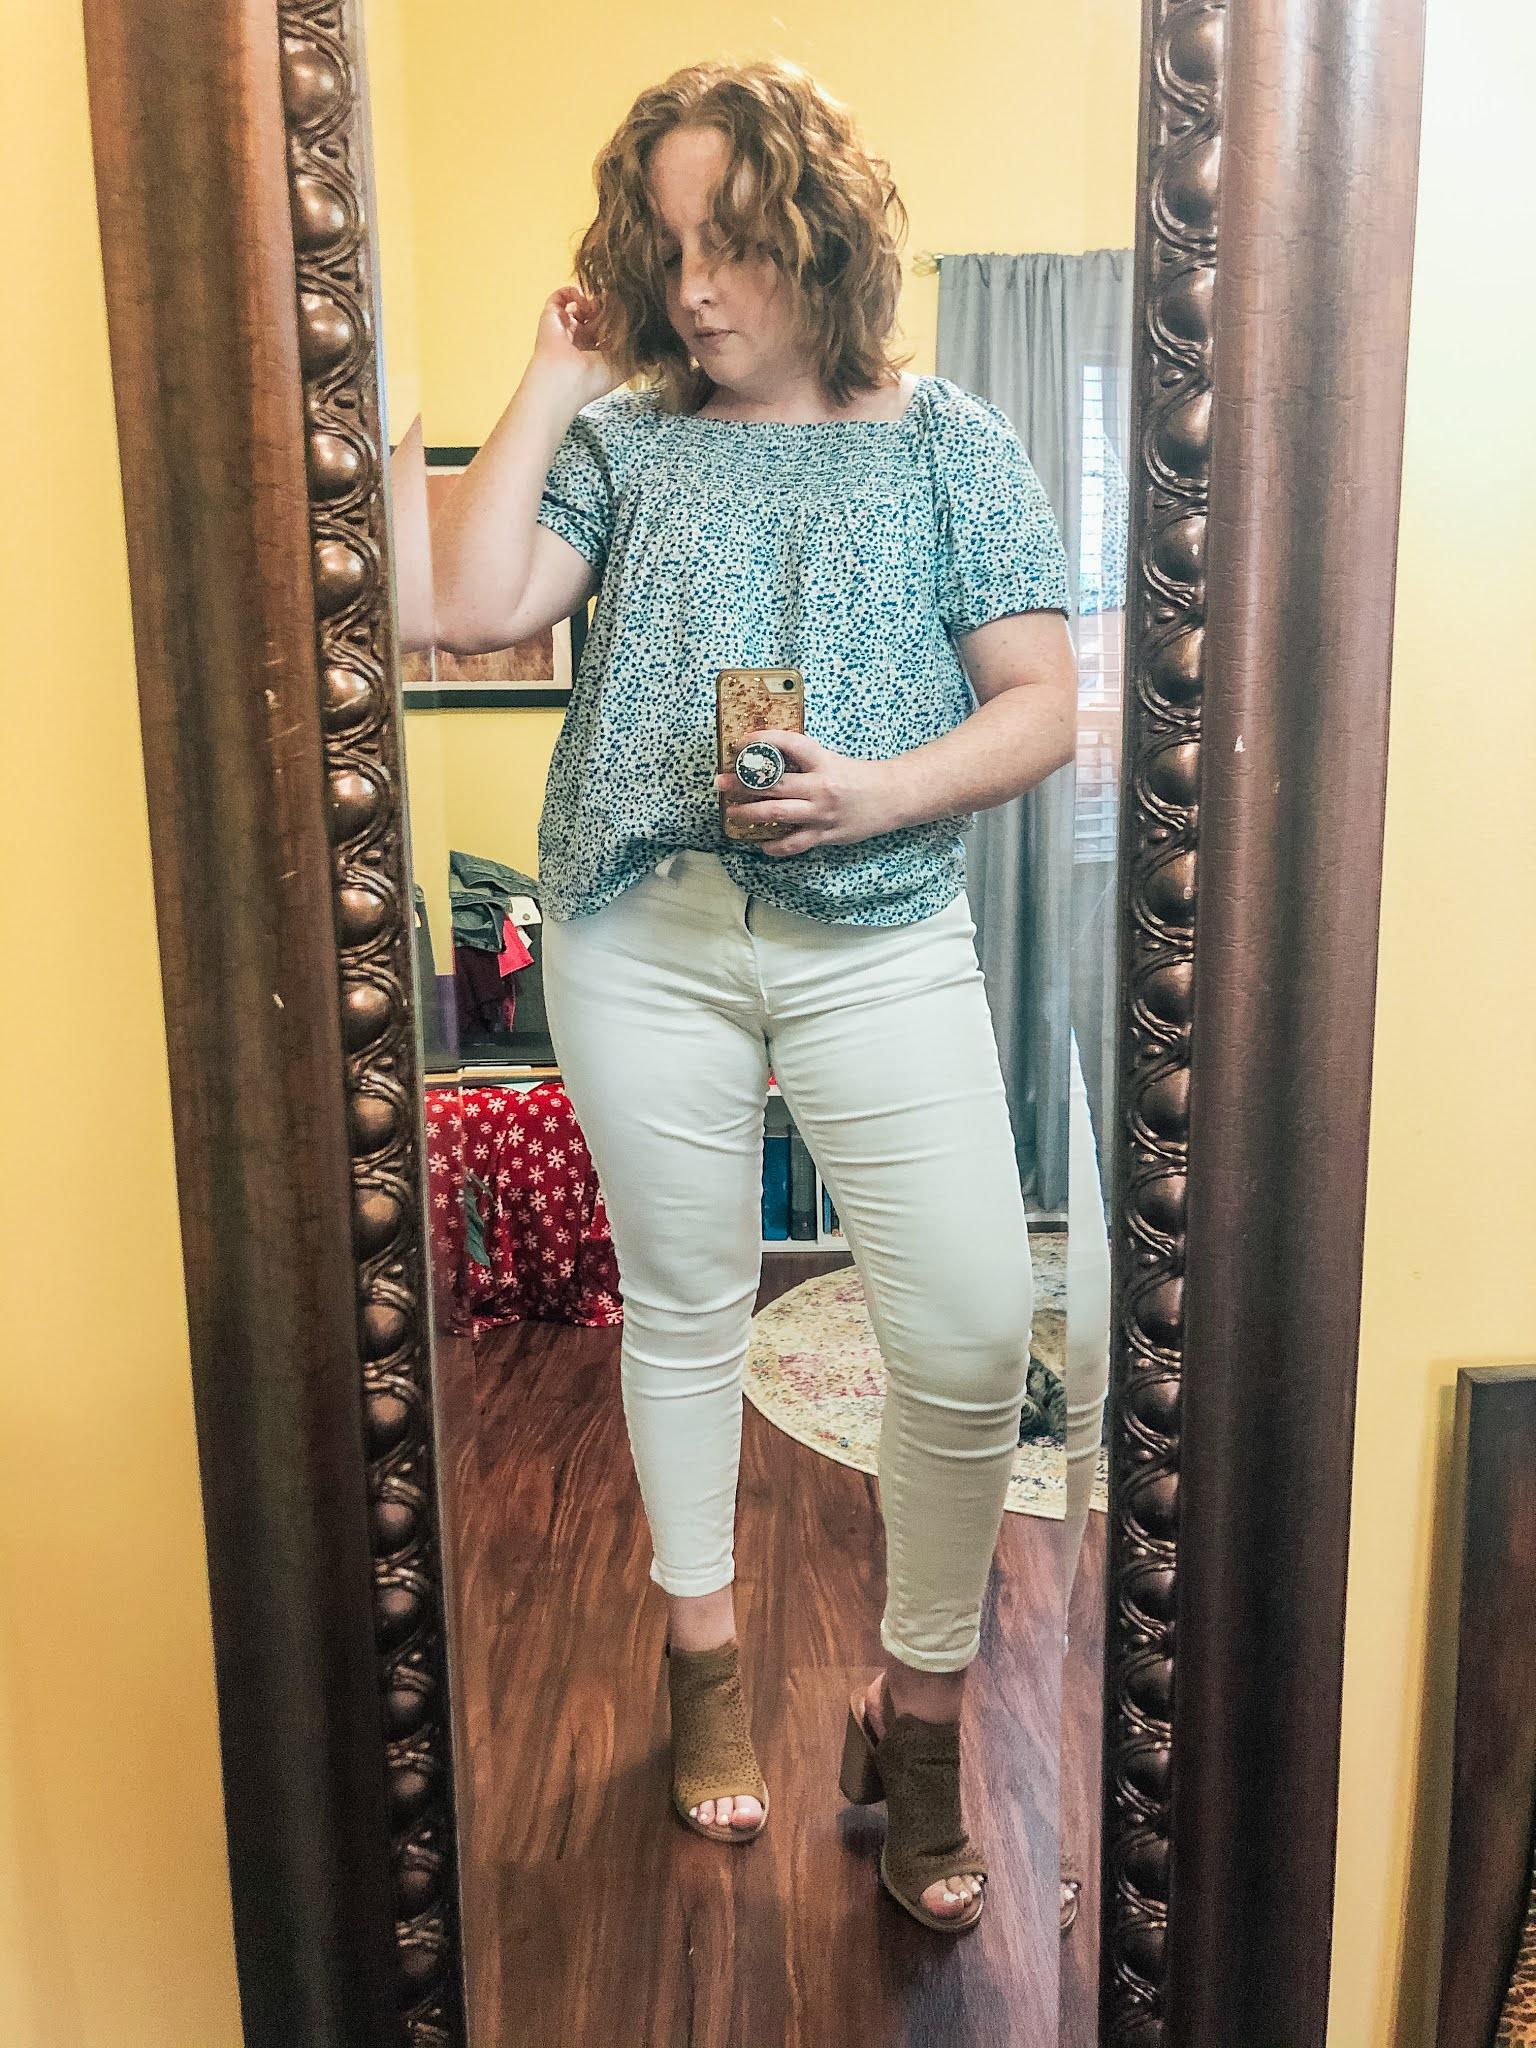 blue-floral-smocked-top-white-jeans-peeptoe-booties